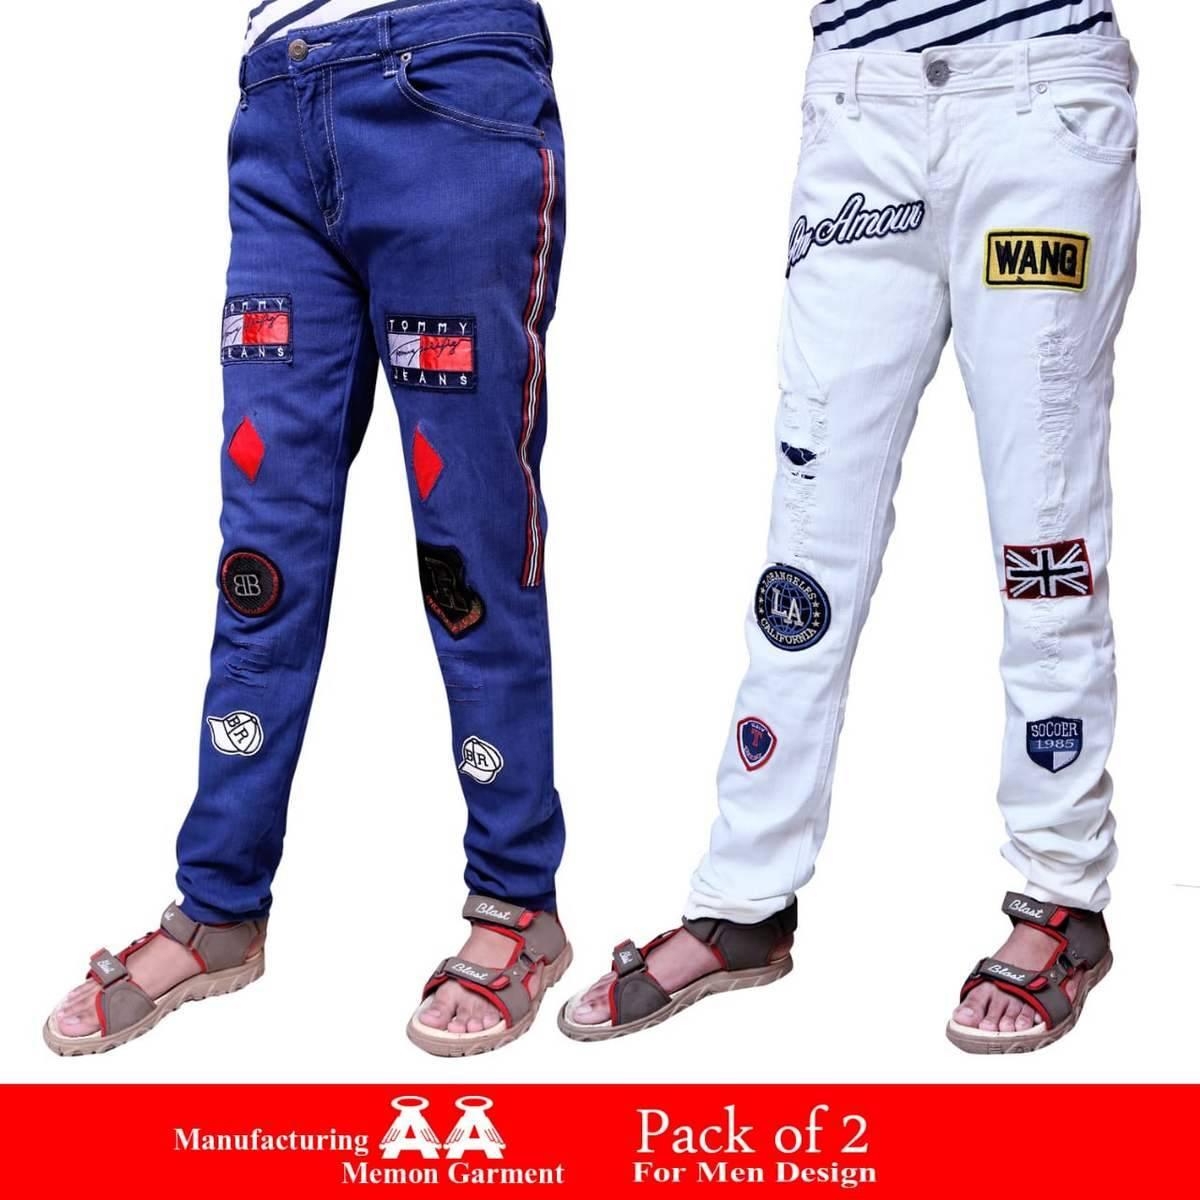 pak of 2 Blue & White Fashion & Stylish Jeans For Men No Ratings